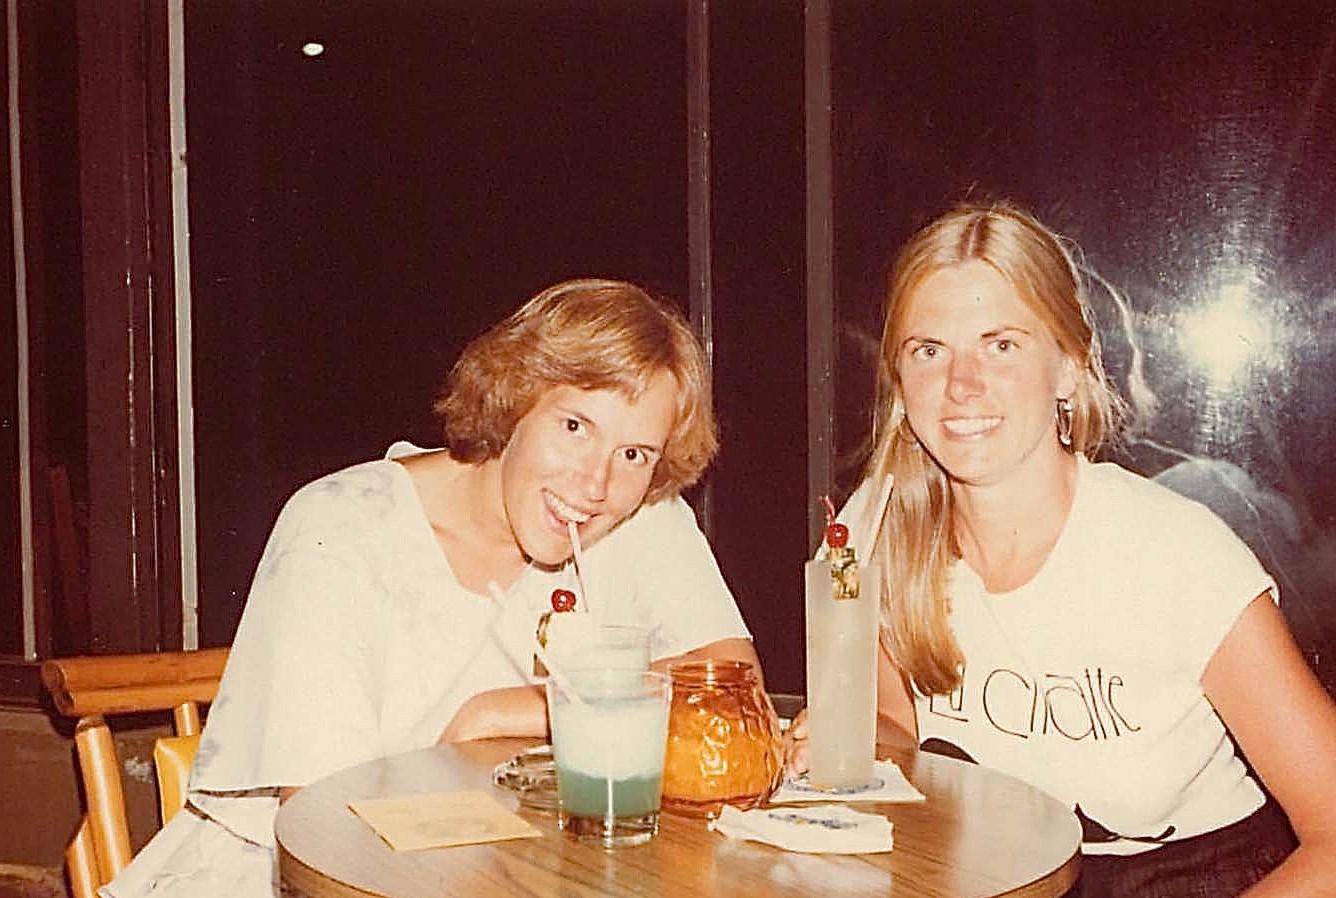 Lorraine & Shirley Plantation Gardens Restaurant, Poipu Beach, Kauai 1976